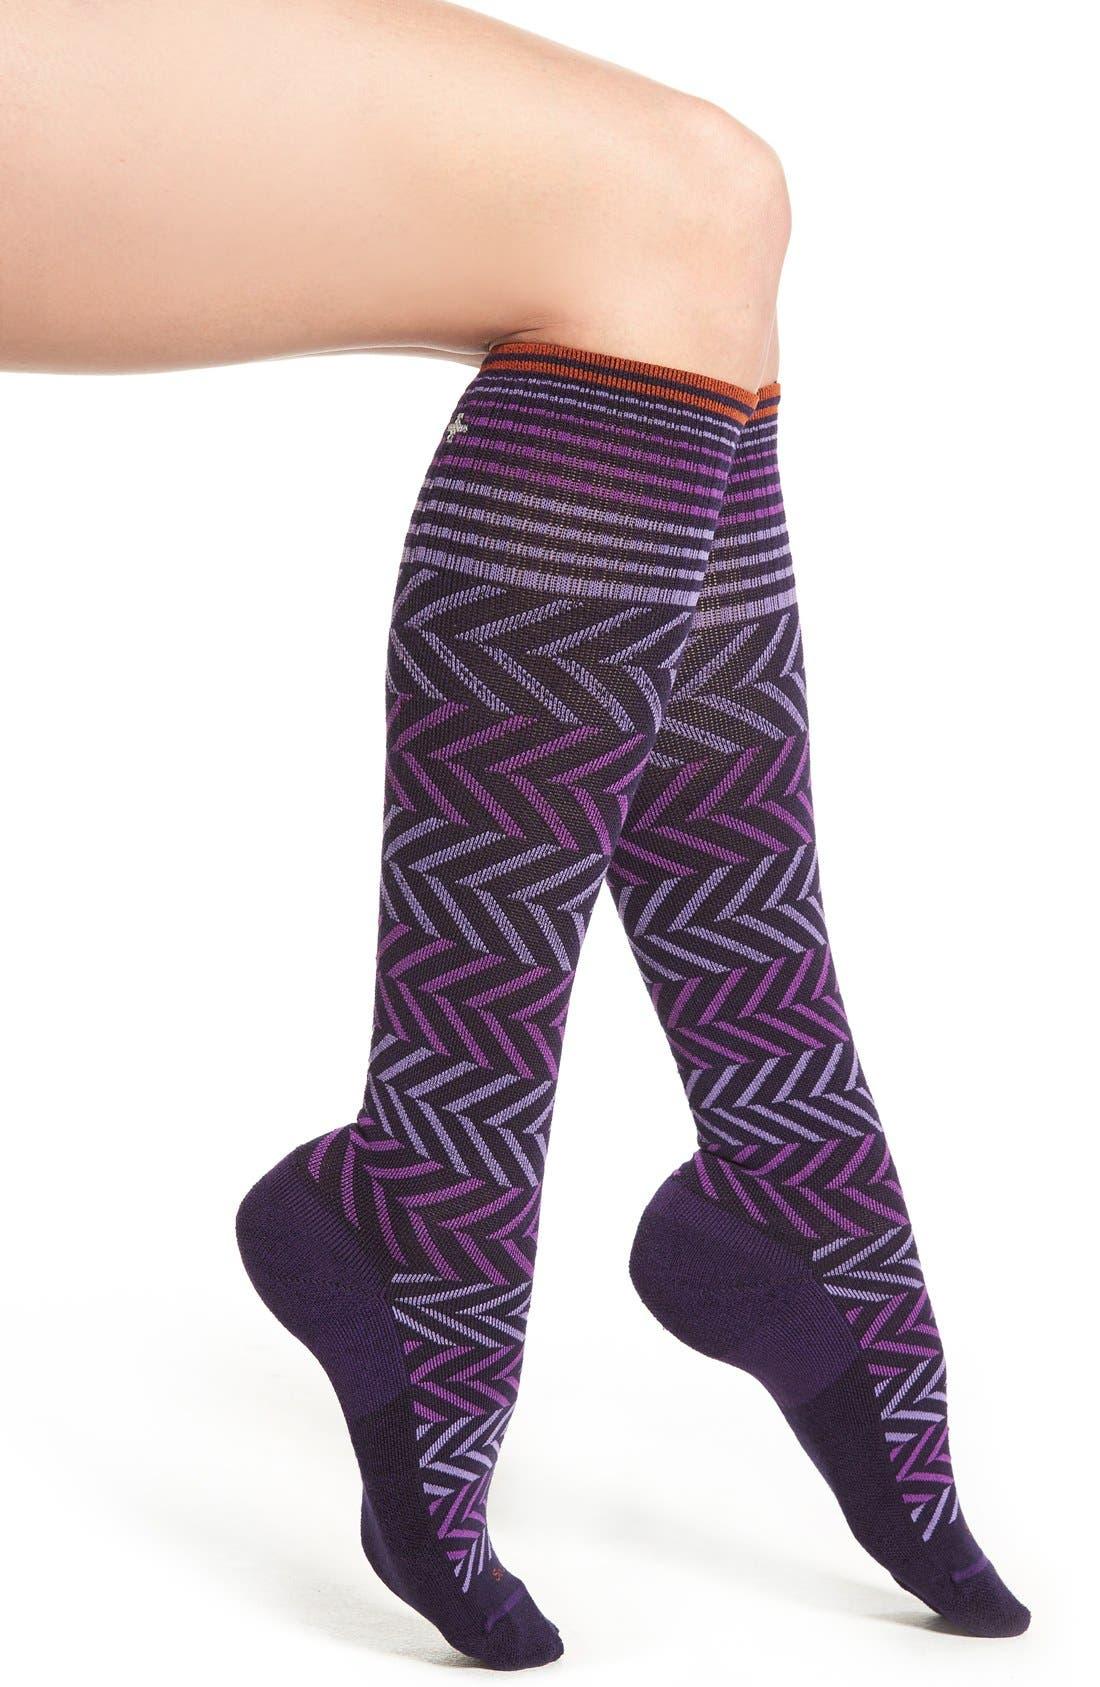 Alternate Image 1 Selected - Sockwell Goodhew Graduated Compression Socks